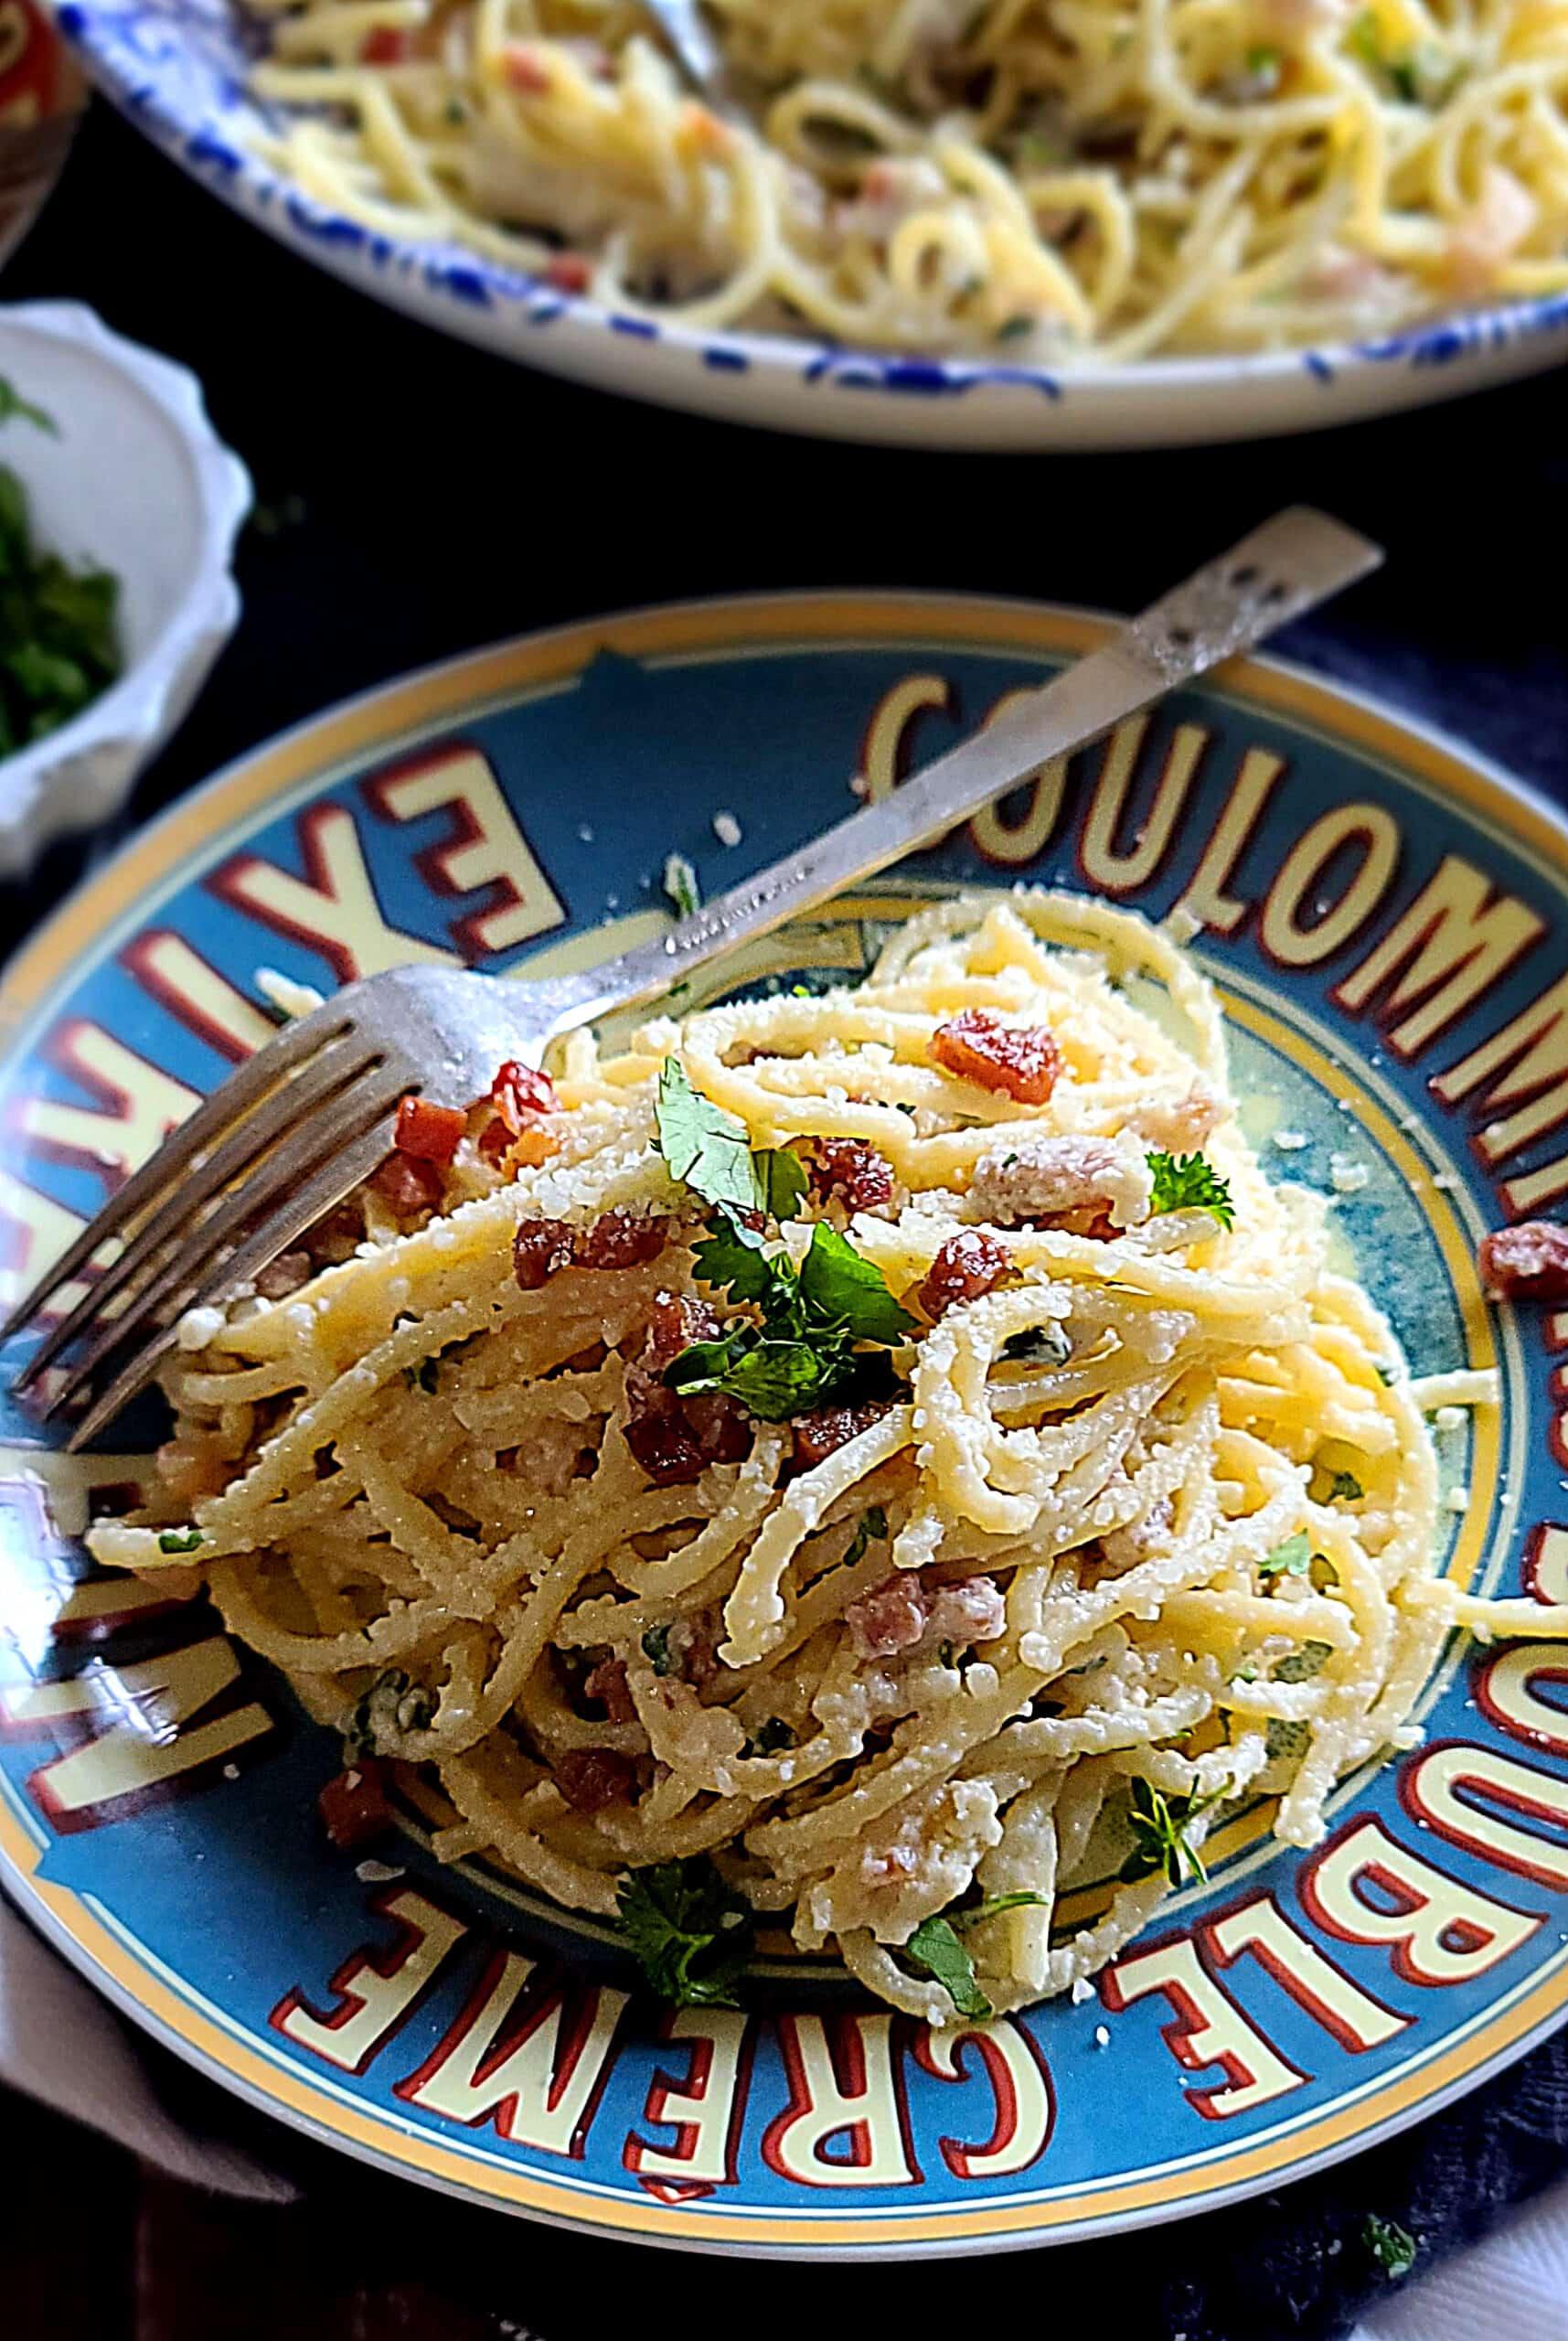 Delicious pasta carbonara on a gray plate - Italianfood.net  Delicious Pasta Carbonara